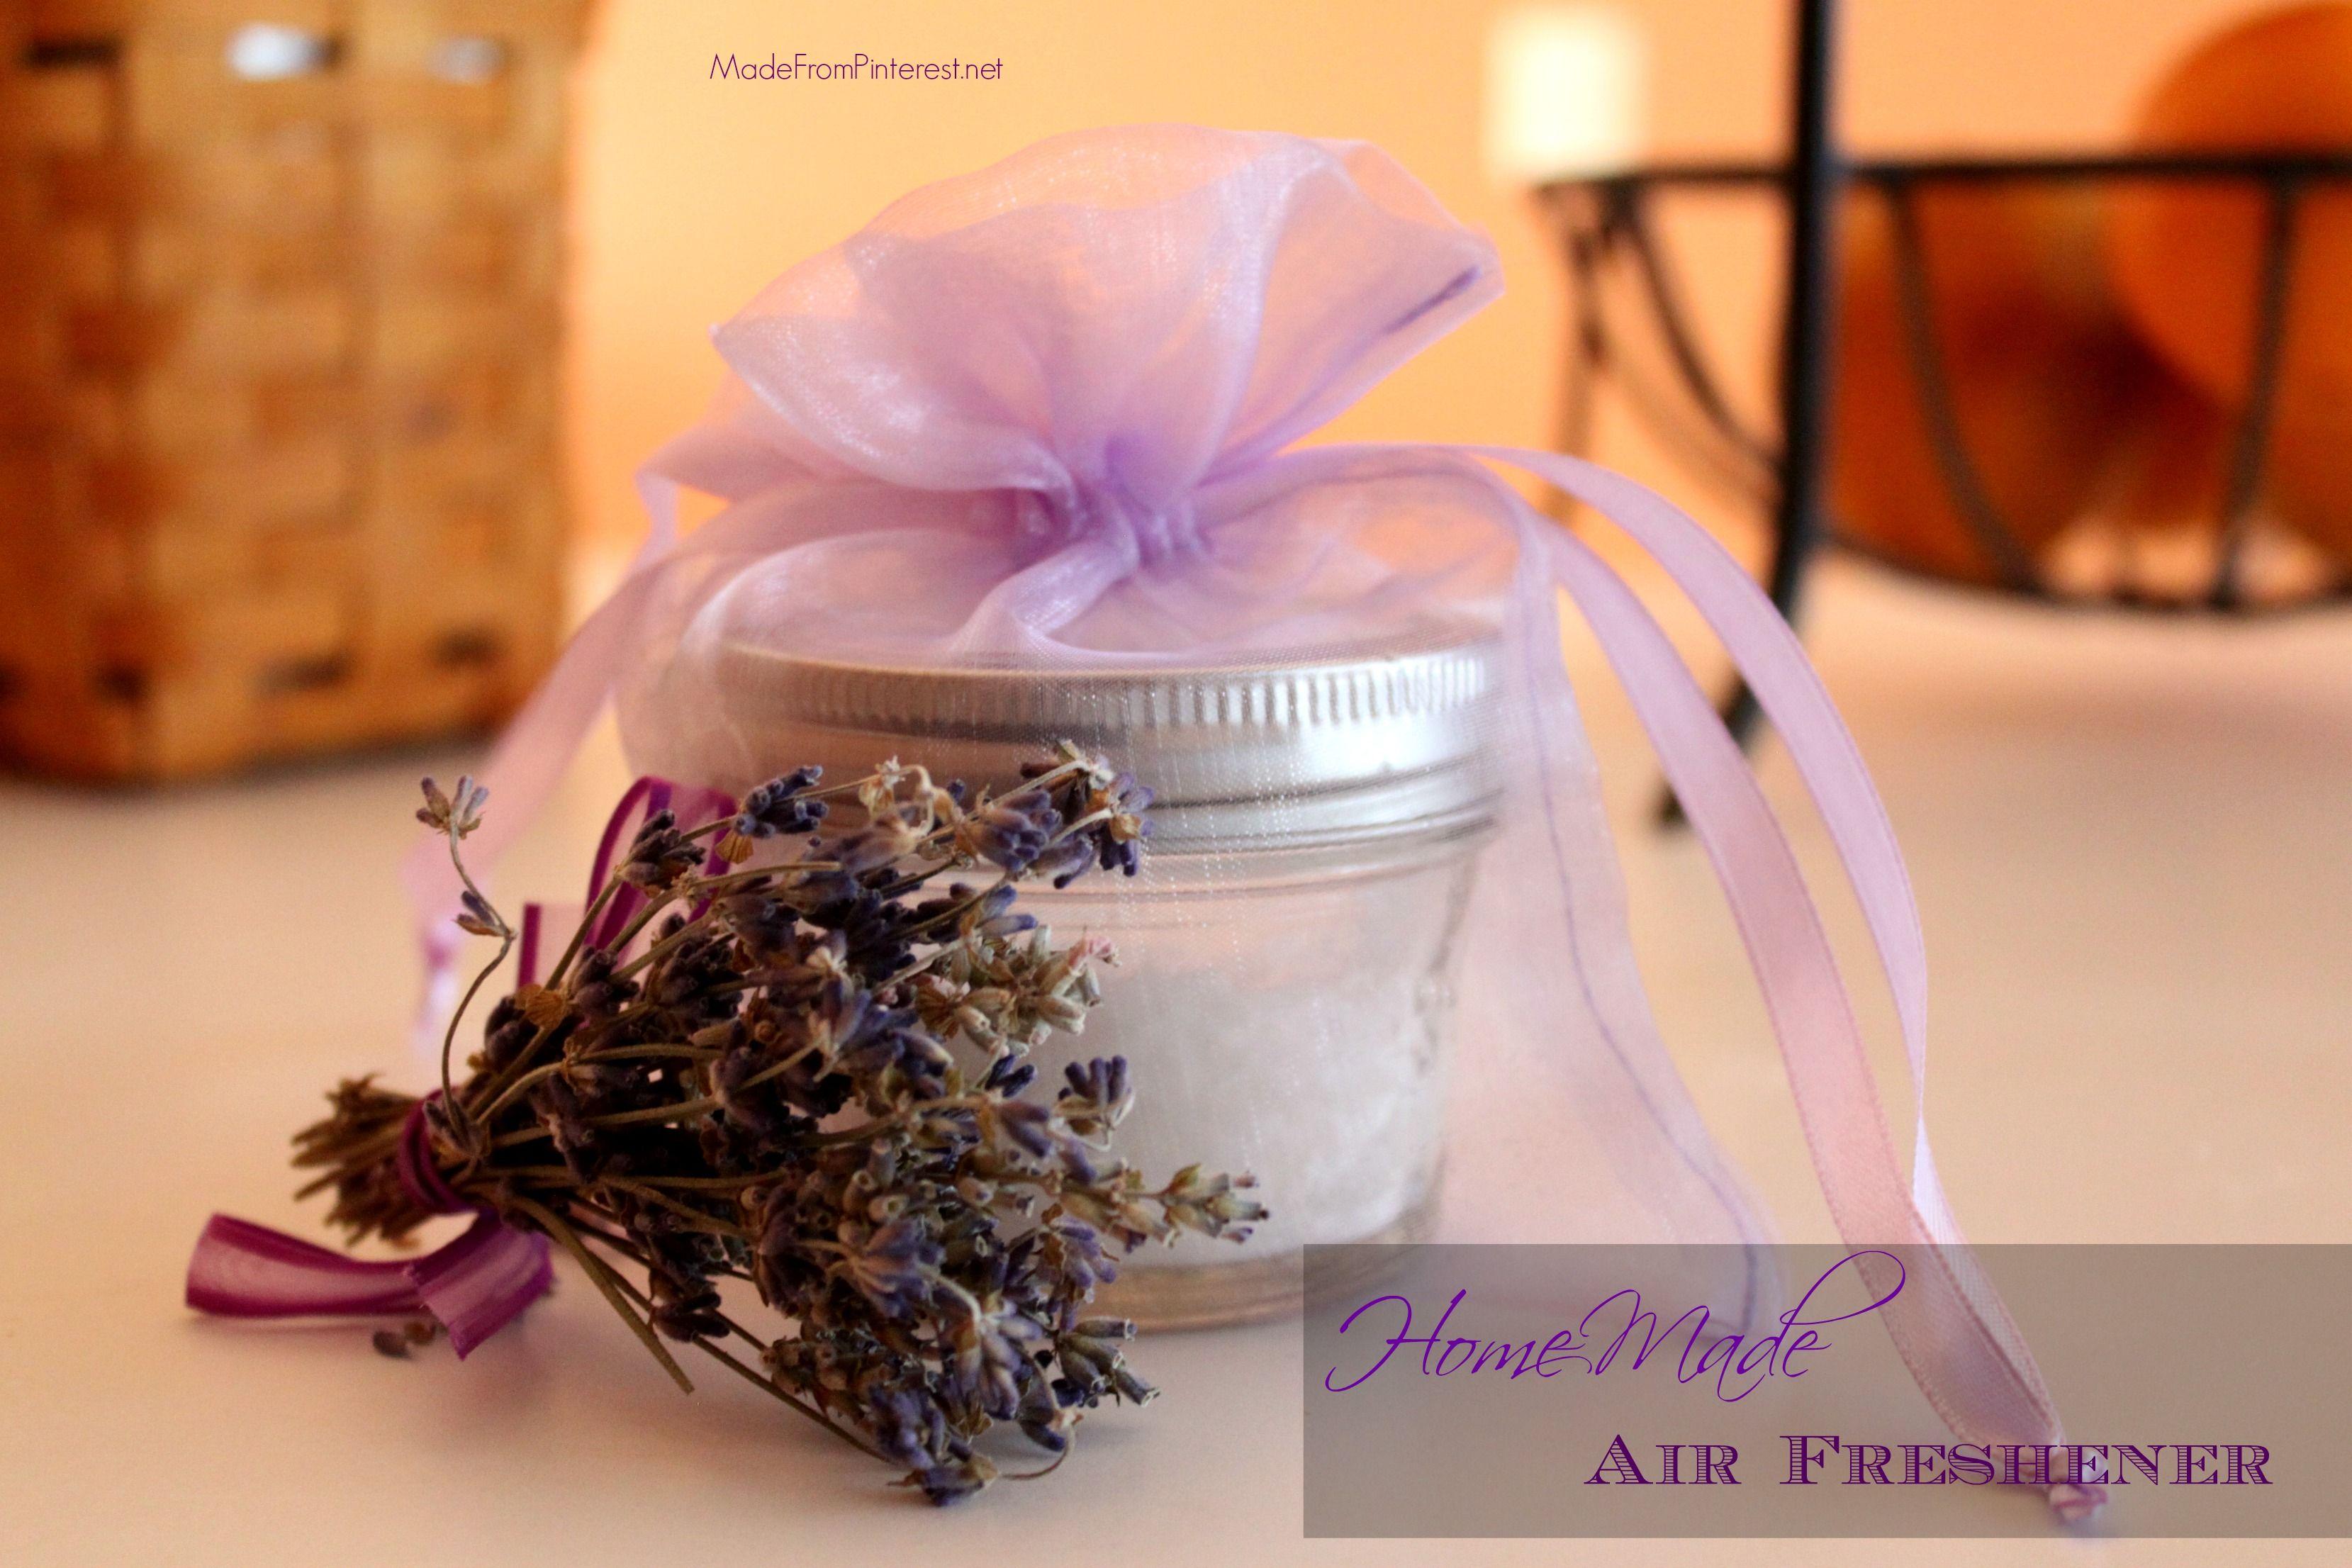 Homemade Air Freshener Homemade air freshener, Diy